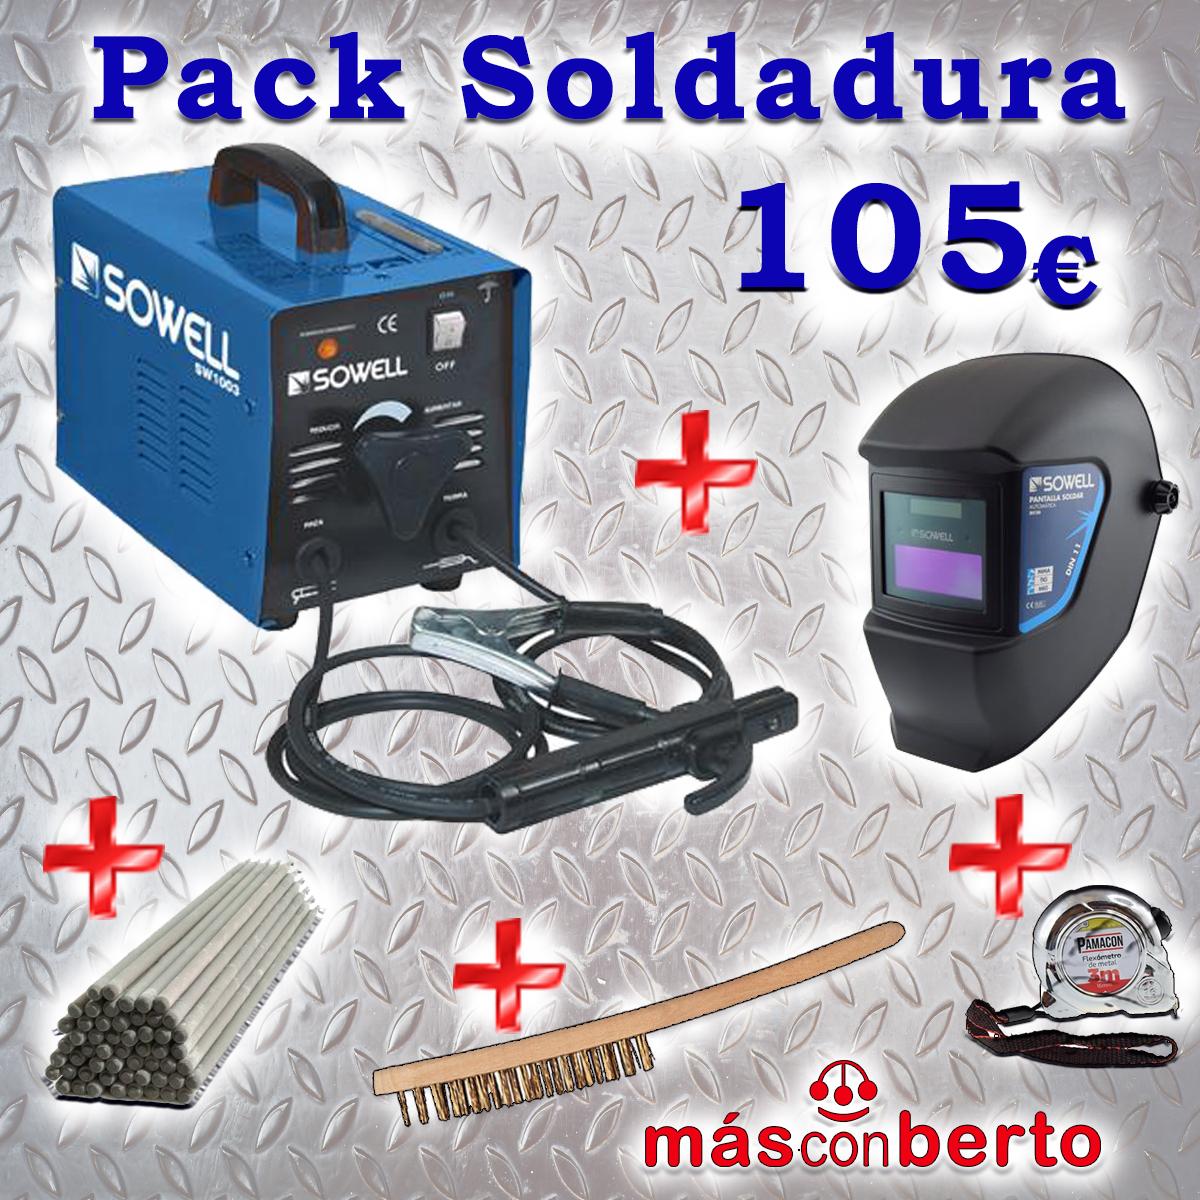 Pack Soldadura SW1003